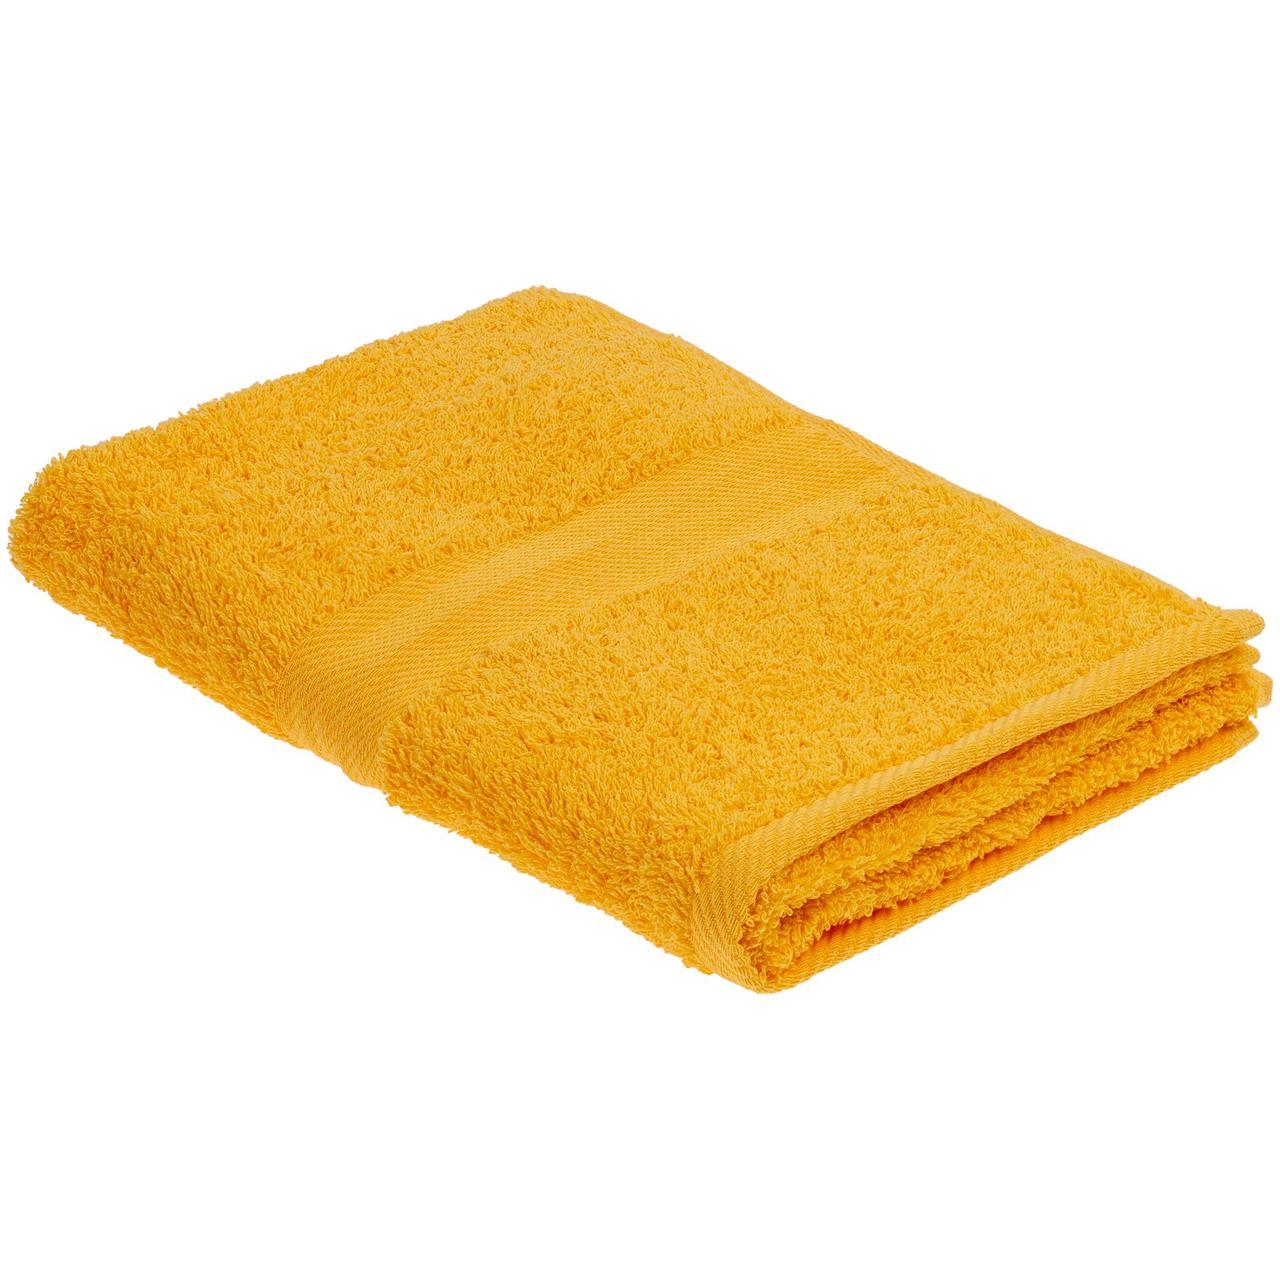 Полотенце Embrace, среднее, желтое (артикул 20099.80)